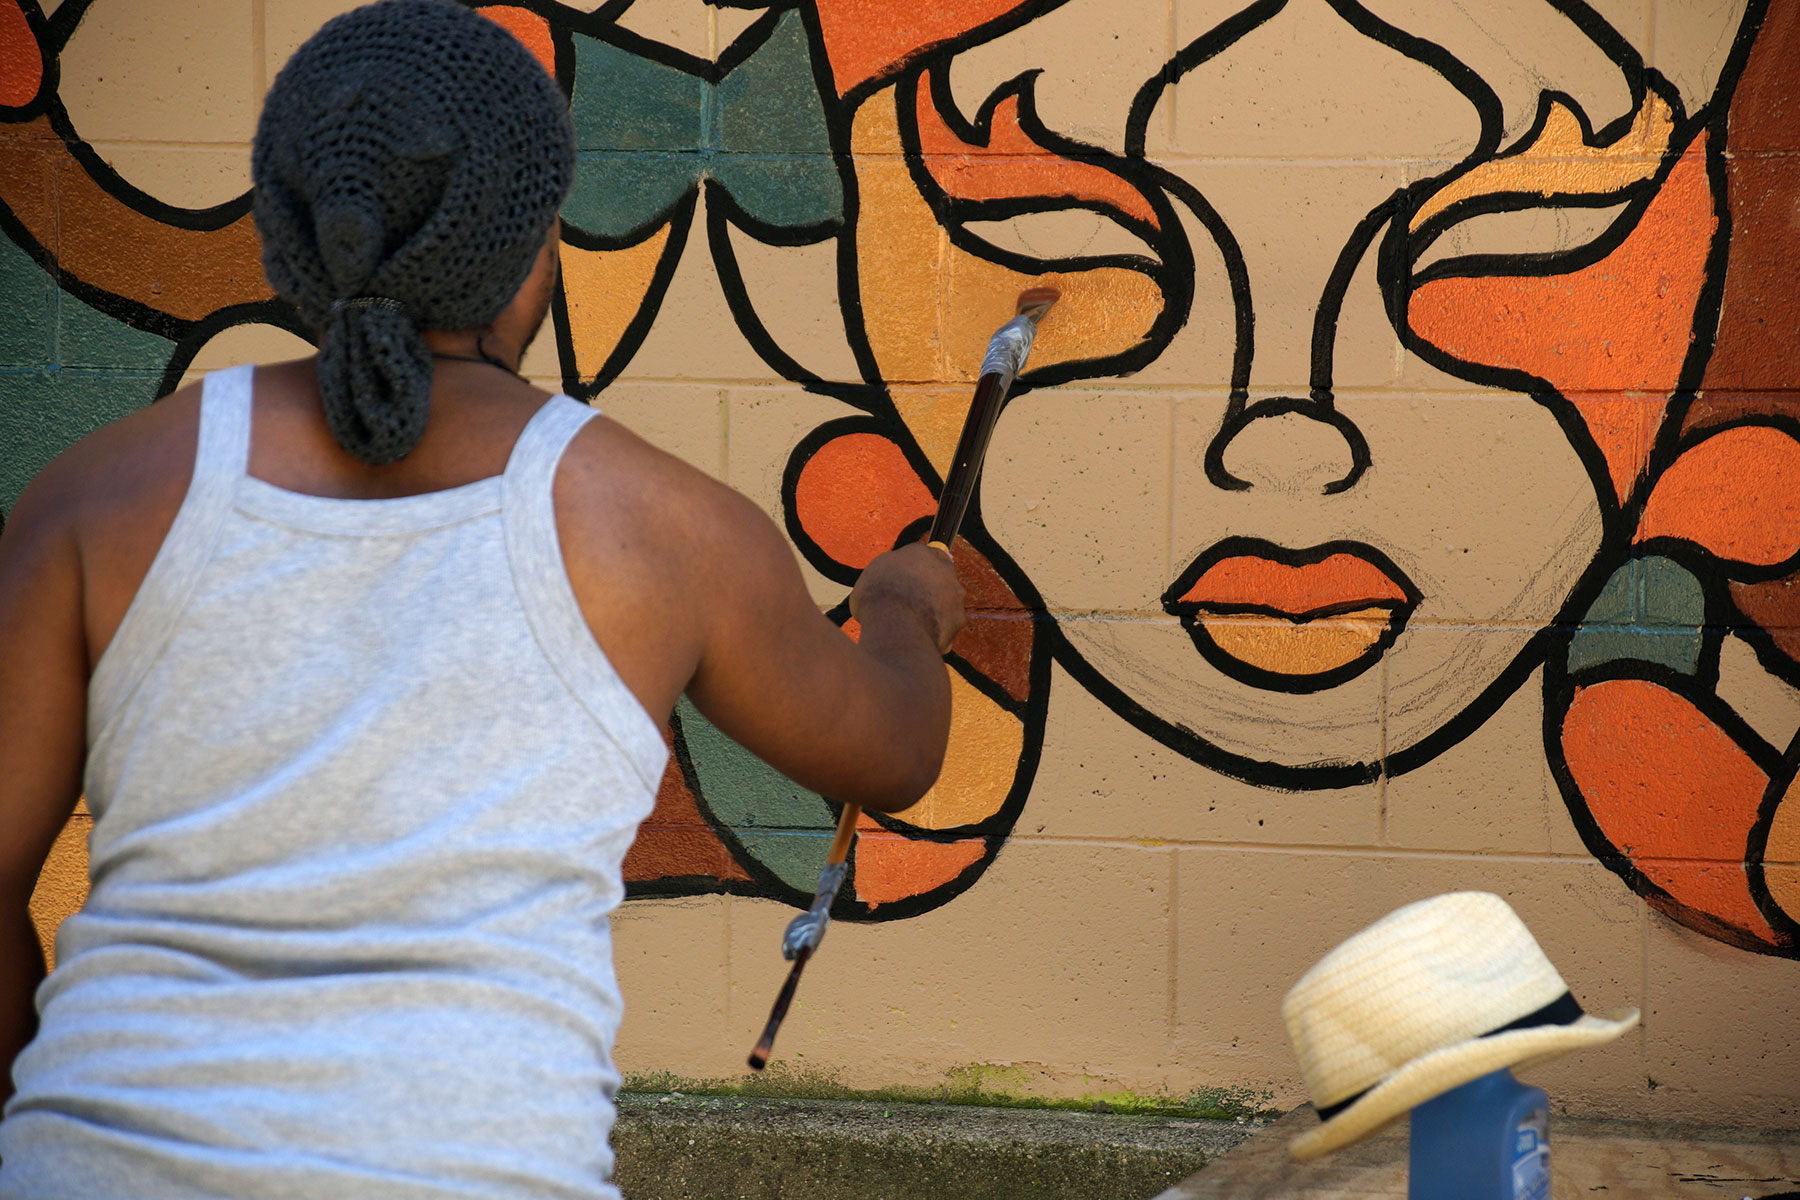 01_091518_muralprogressbca_708